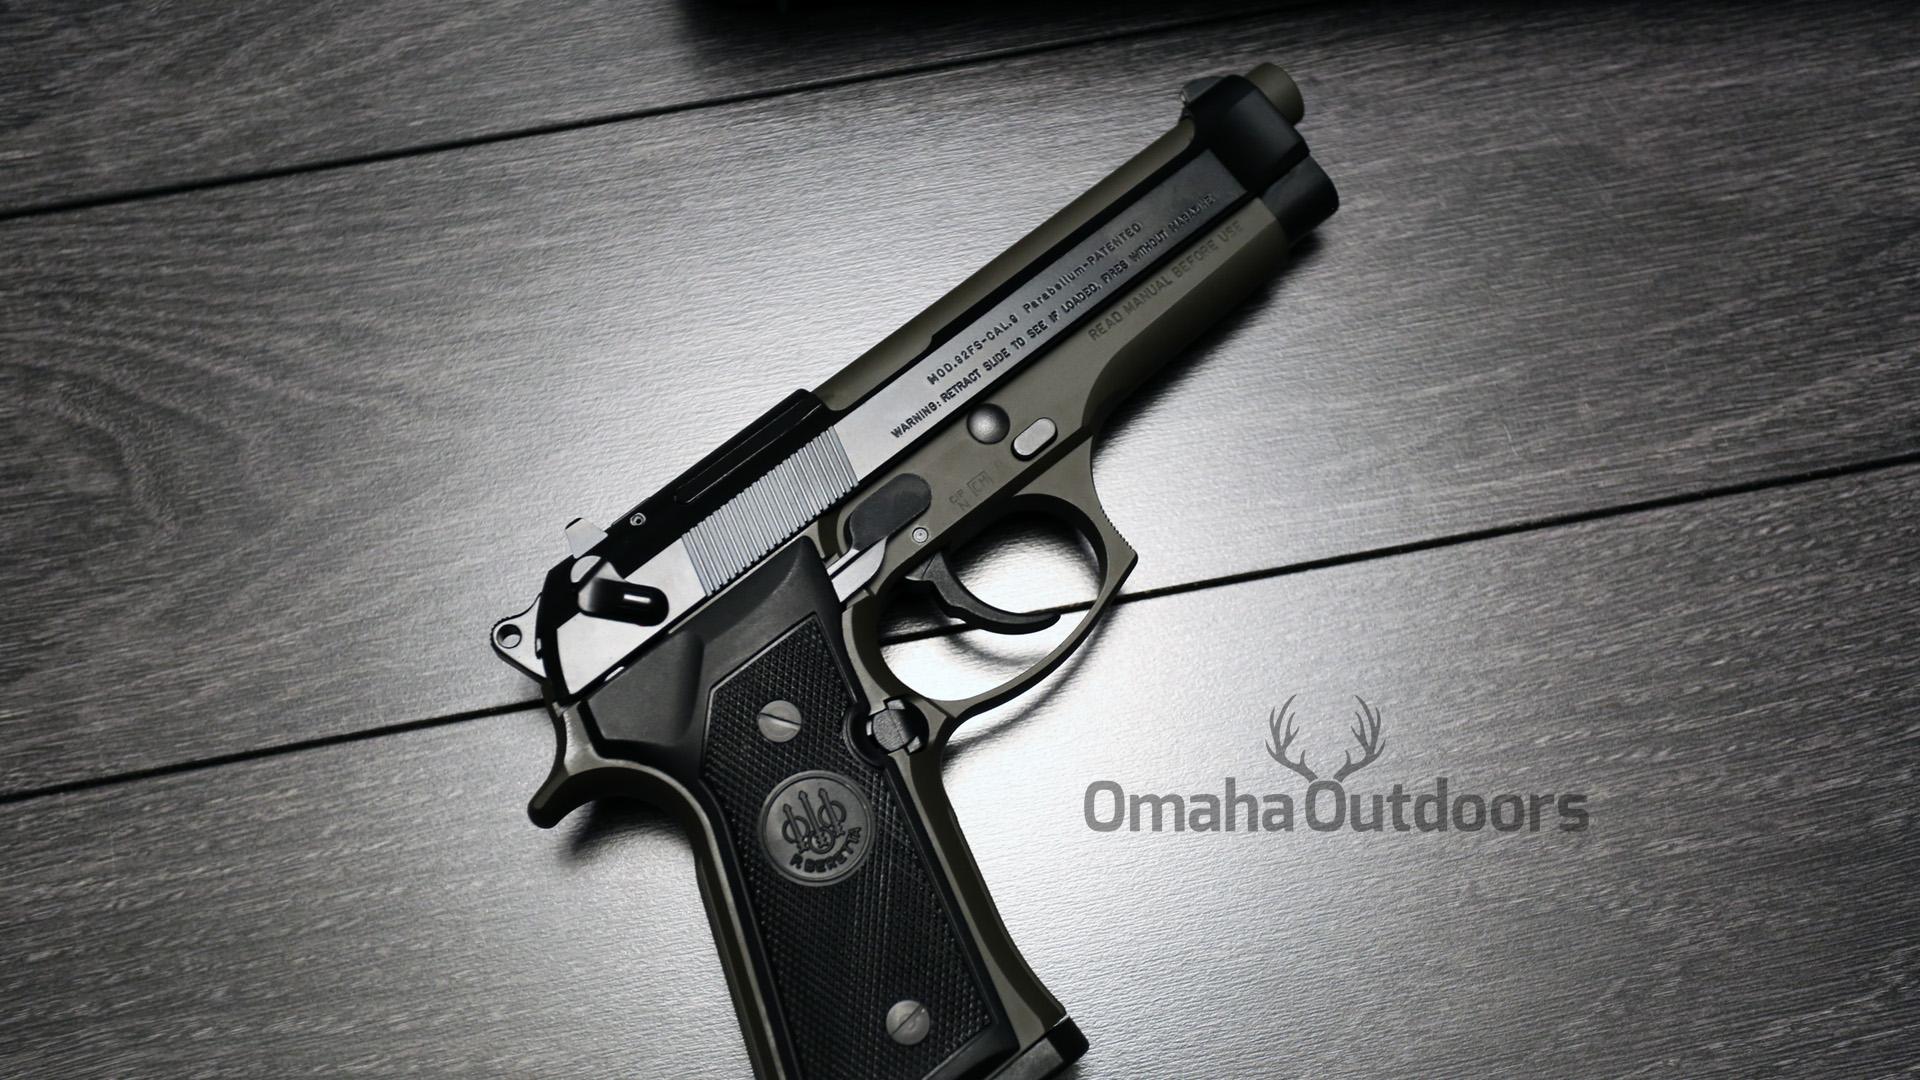 Gun Review: Beretta 92FS 9mm - The 30th Anniversary - Omaha Outdoors